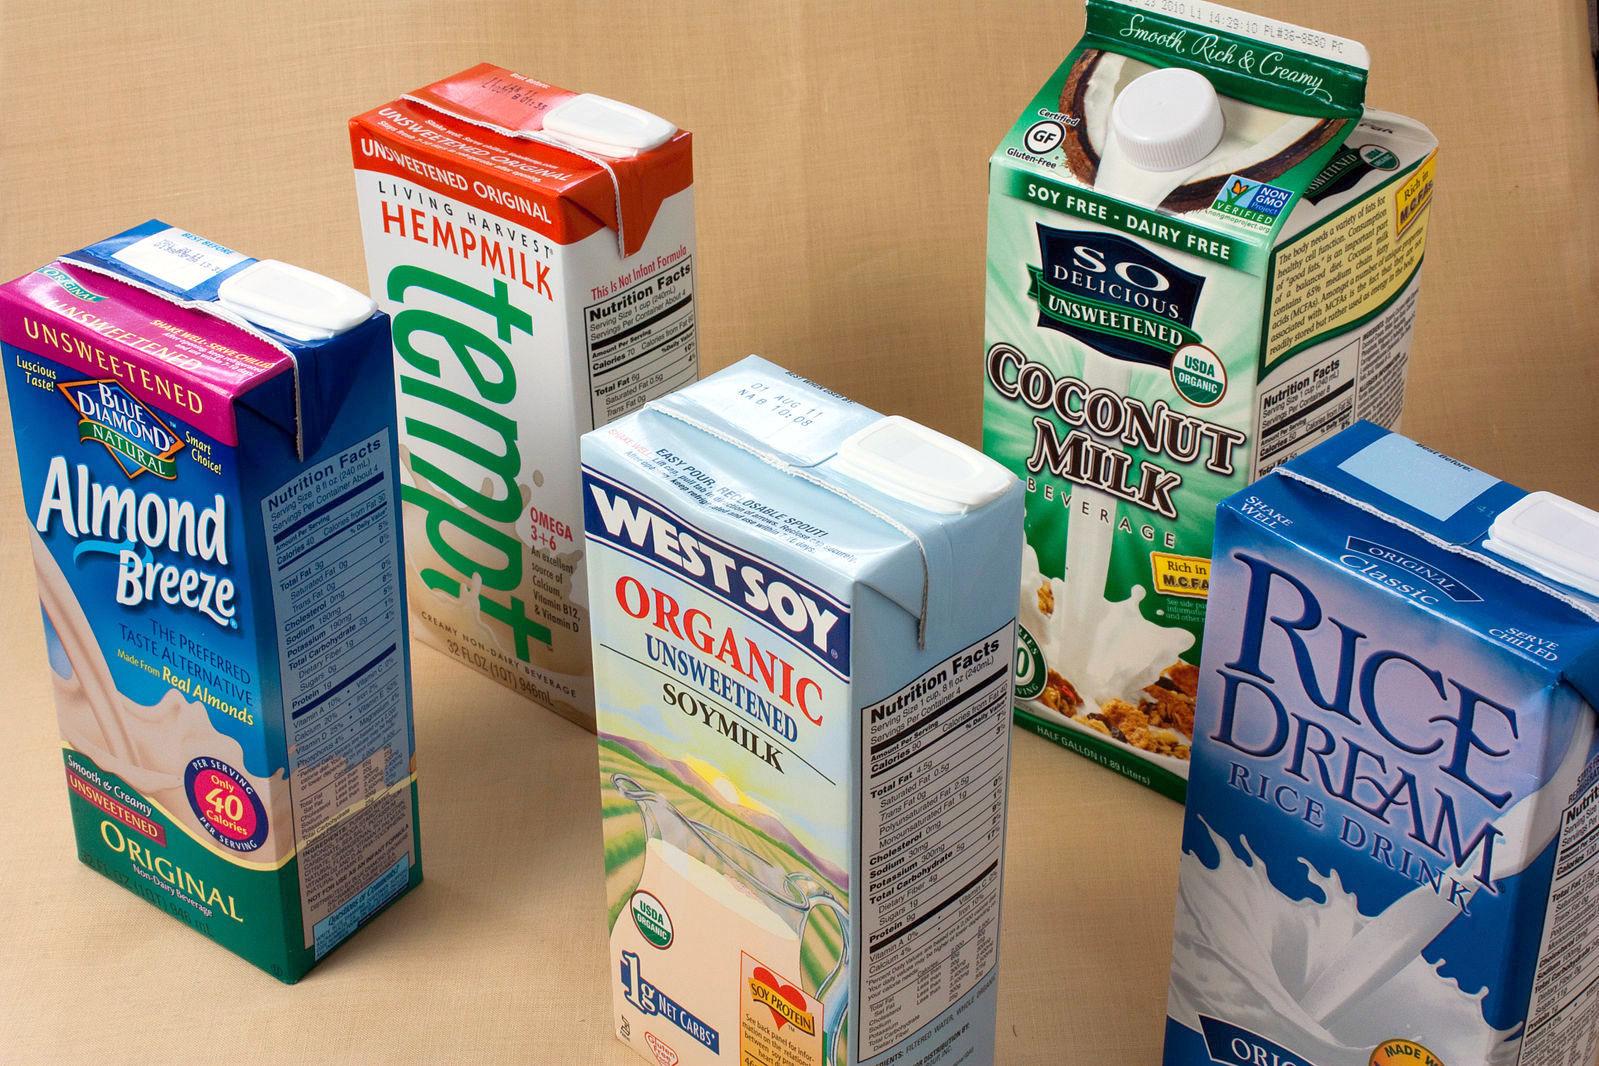 plant_milk_cartons_september_2010